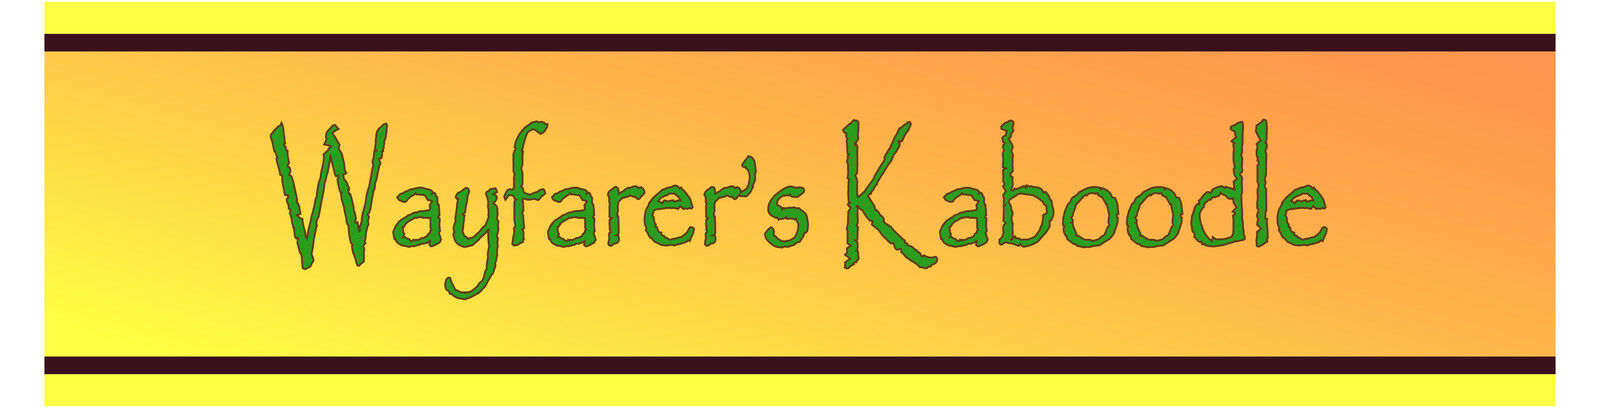 Wayfarer's Kaboodle